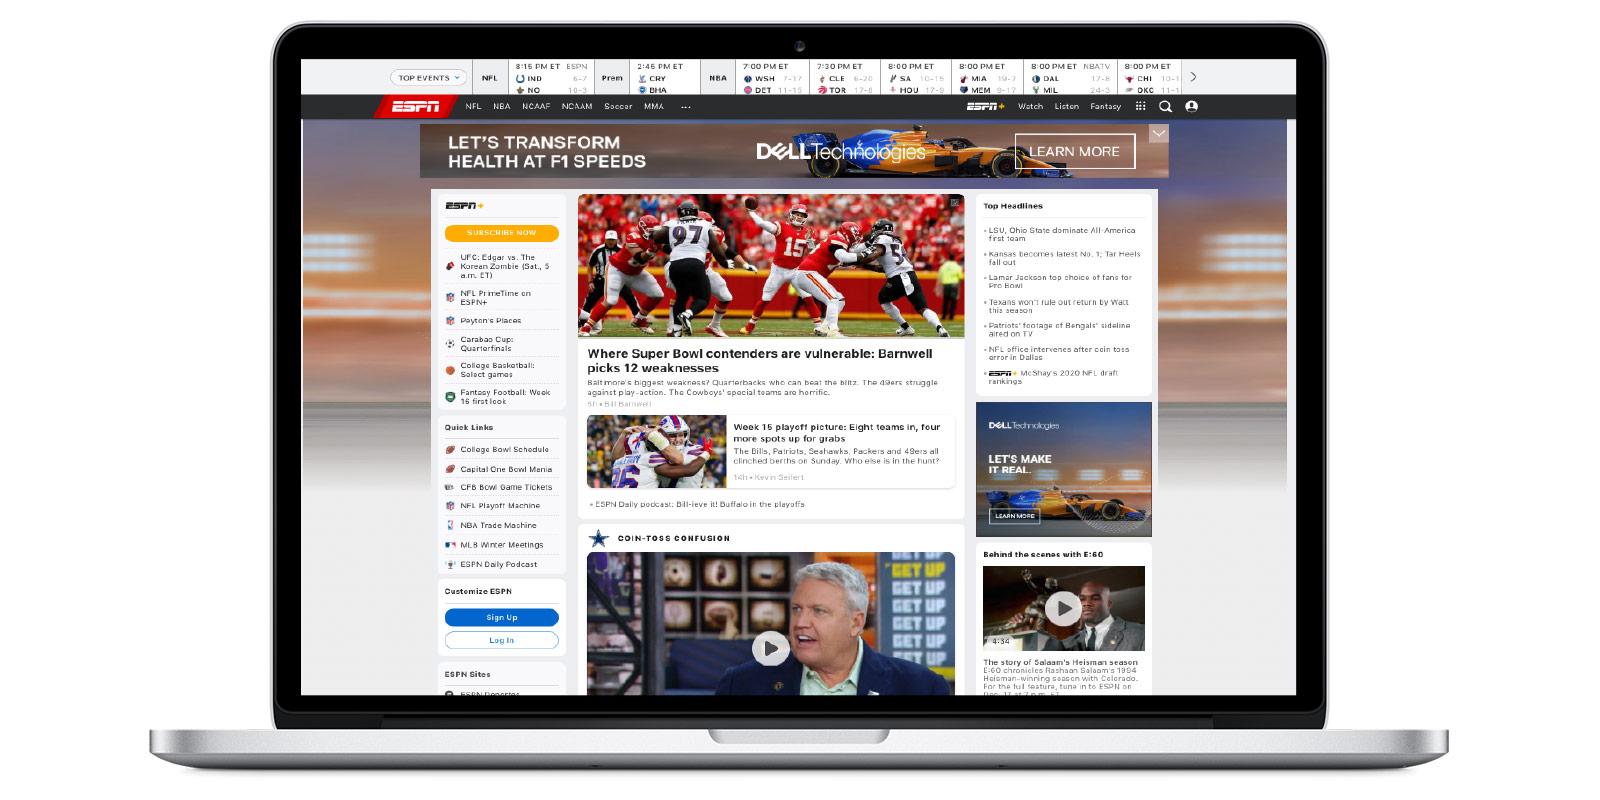 High impact ESPN ad formats include Wallpaper